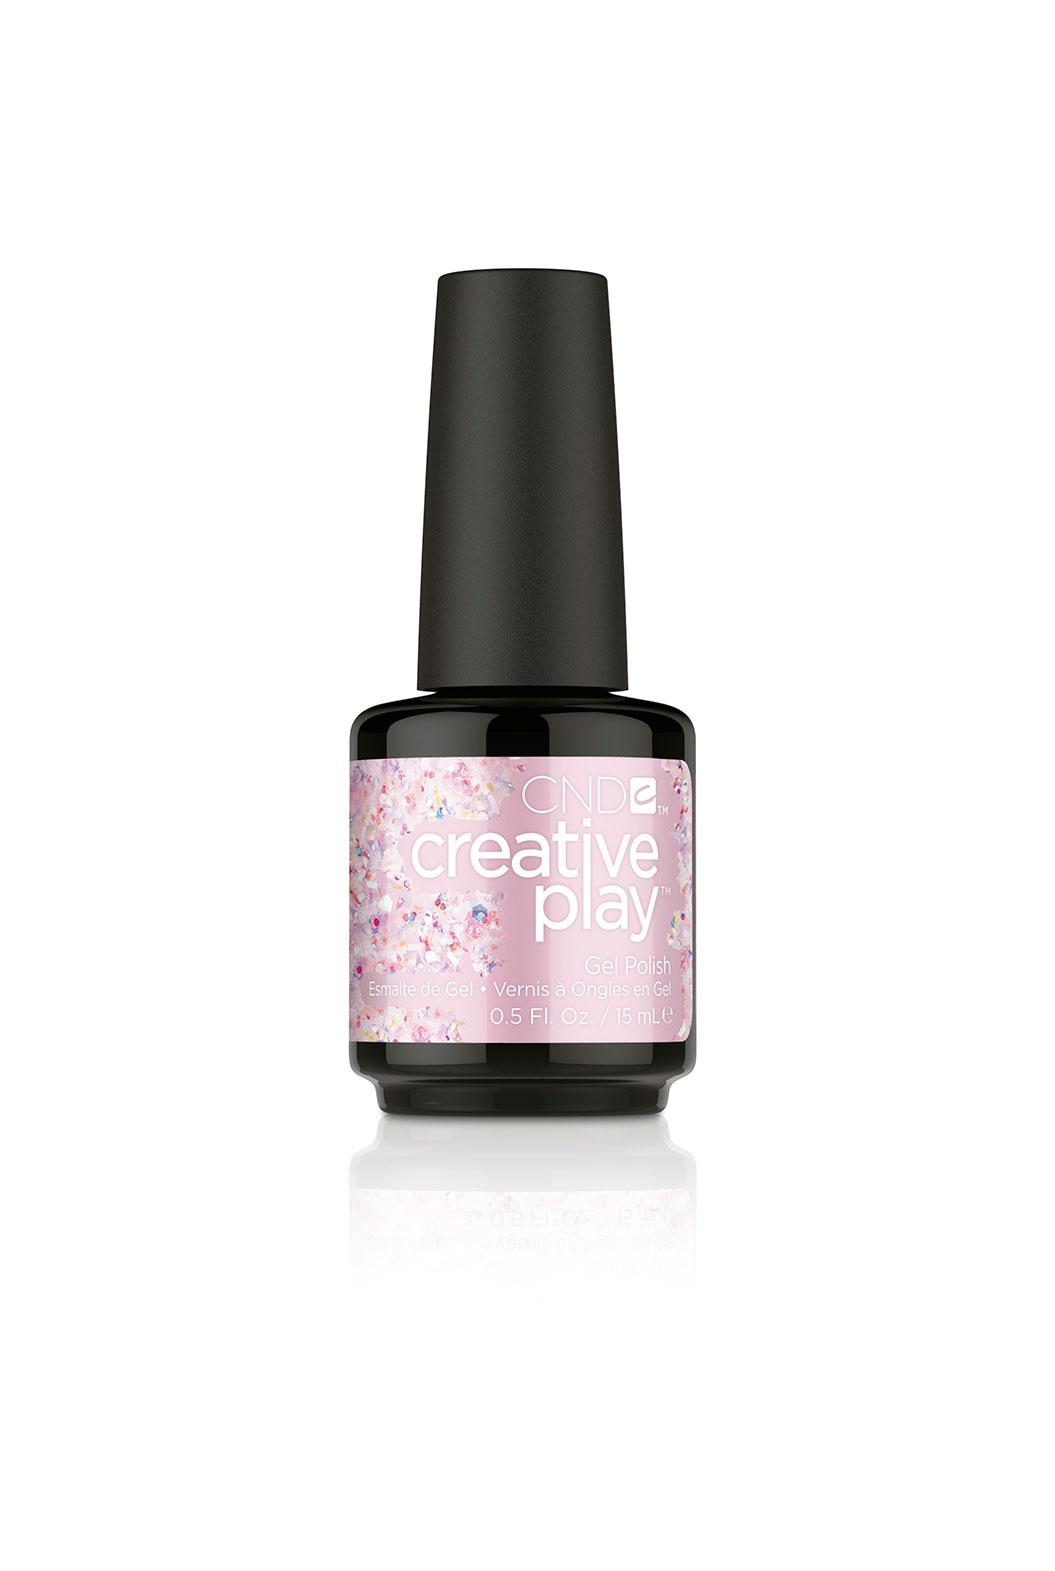 CND 466 гель-лак для ногтей / Got A Light Creative Play Gel 15 мл